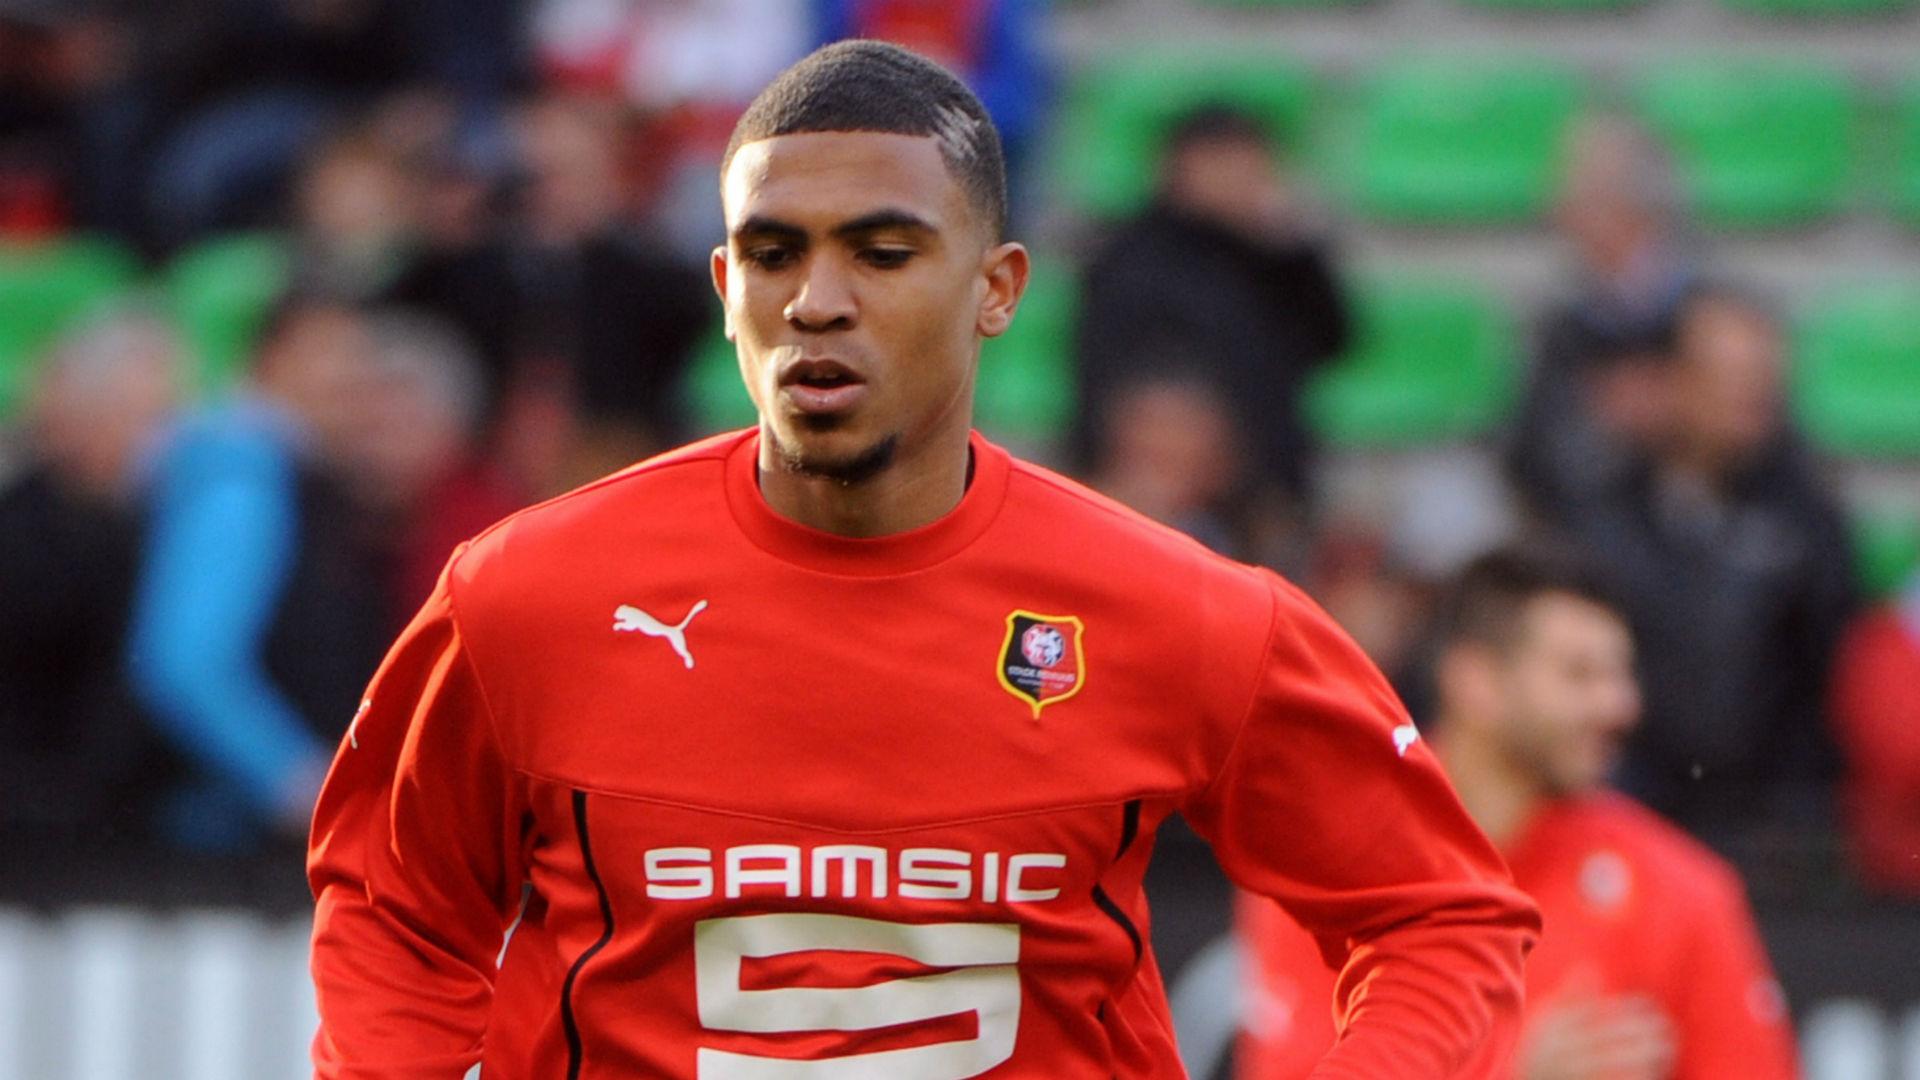 Cedric Hountondji Rennes Ligue 1